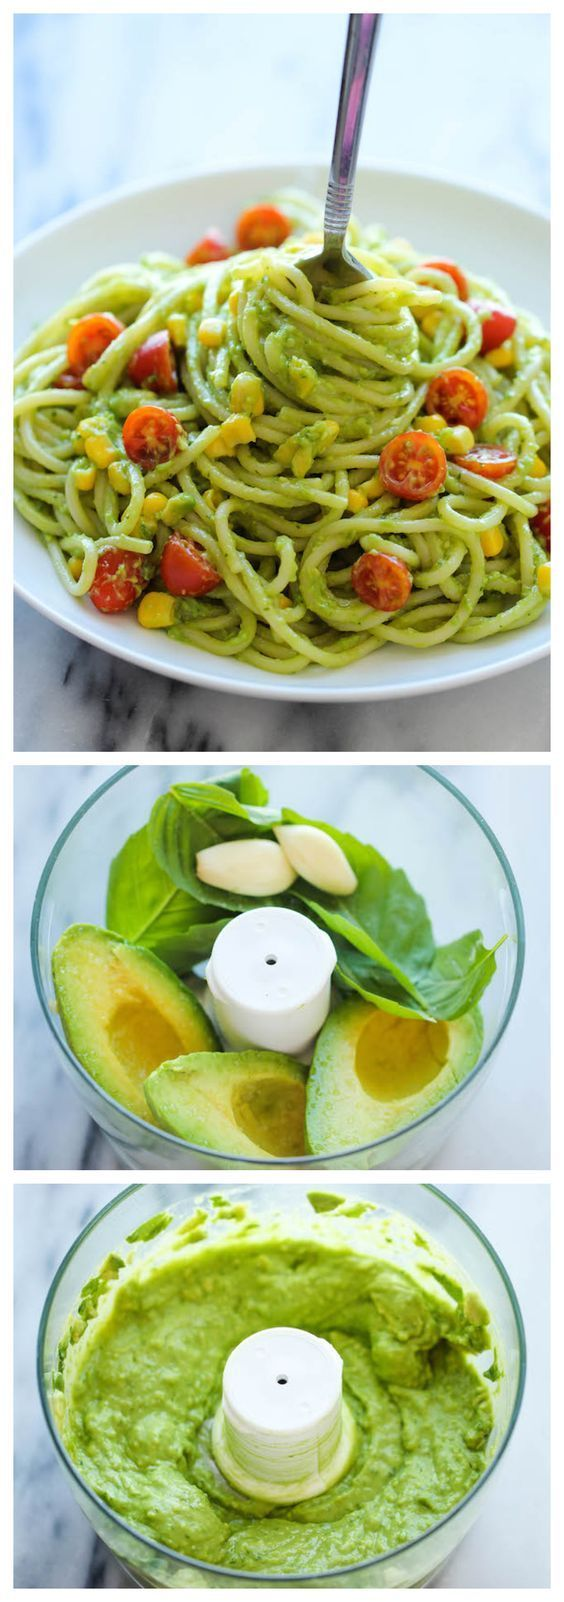 Avocado Pasta Recipe | Buzz Inspired